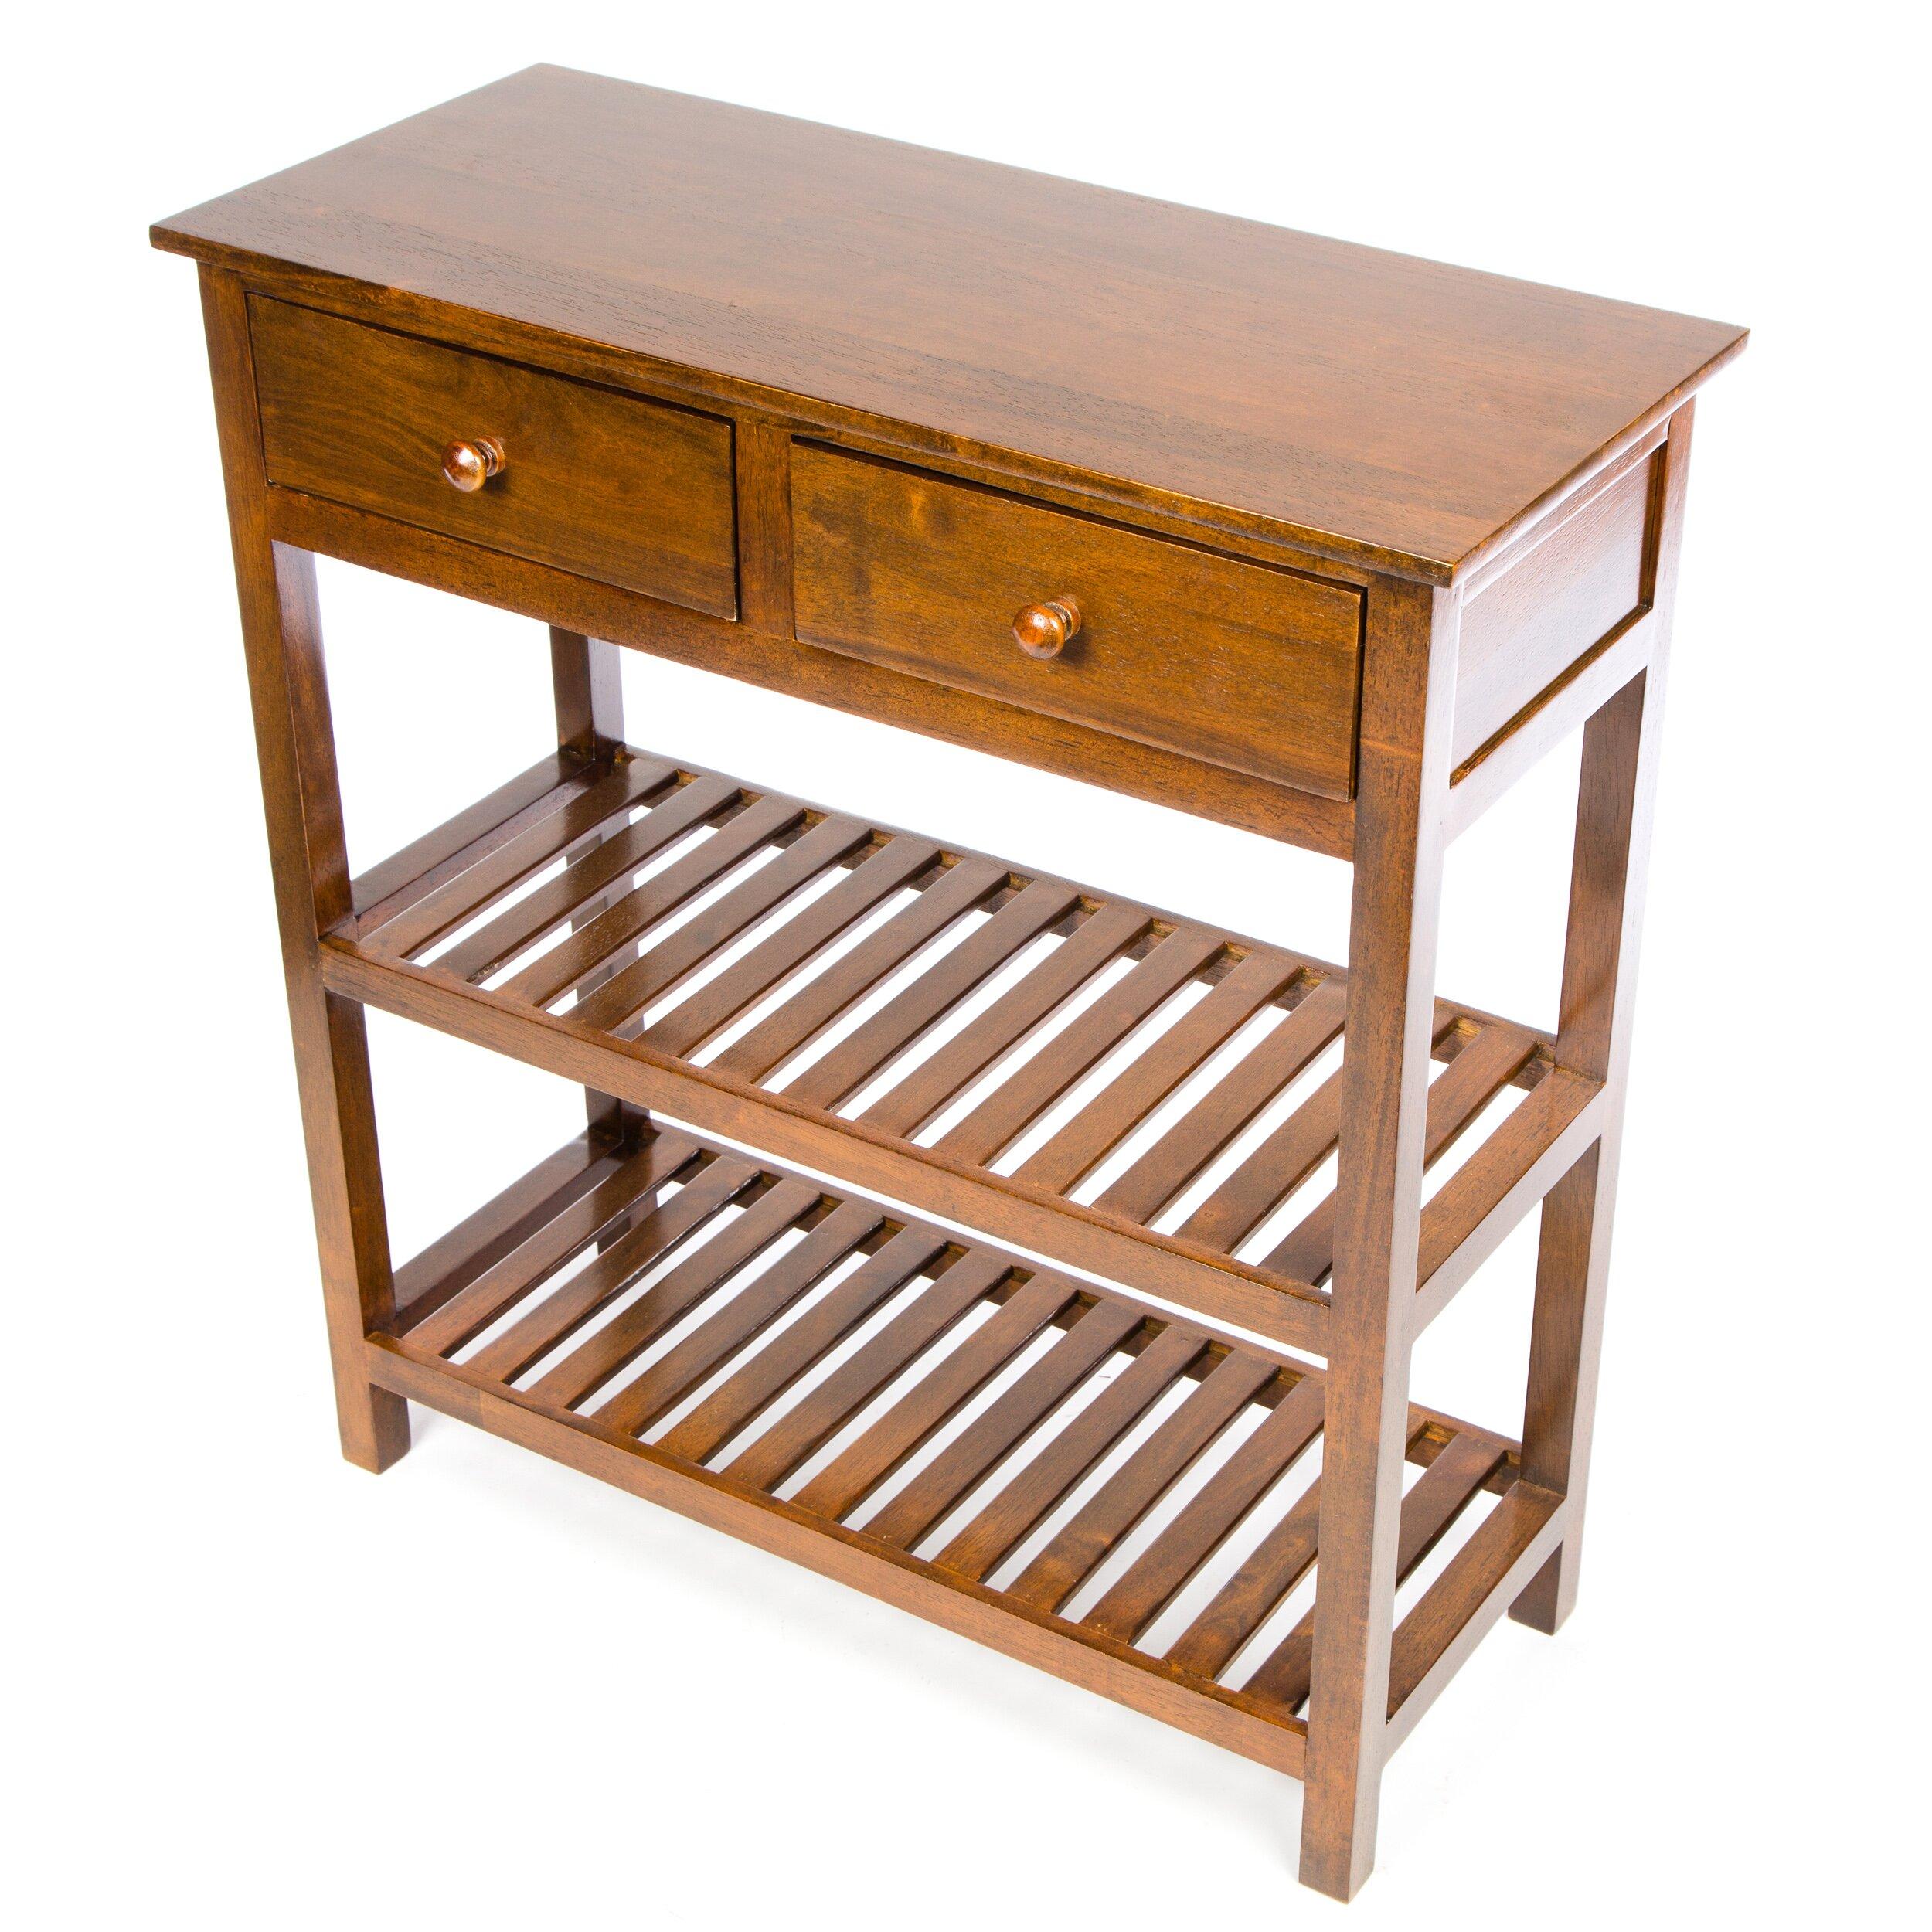 wrigglebox accent console table reviews wayfair uk. Black Bedroom Furniture Sets. Home Design Ideas